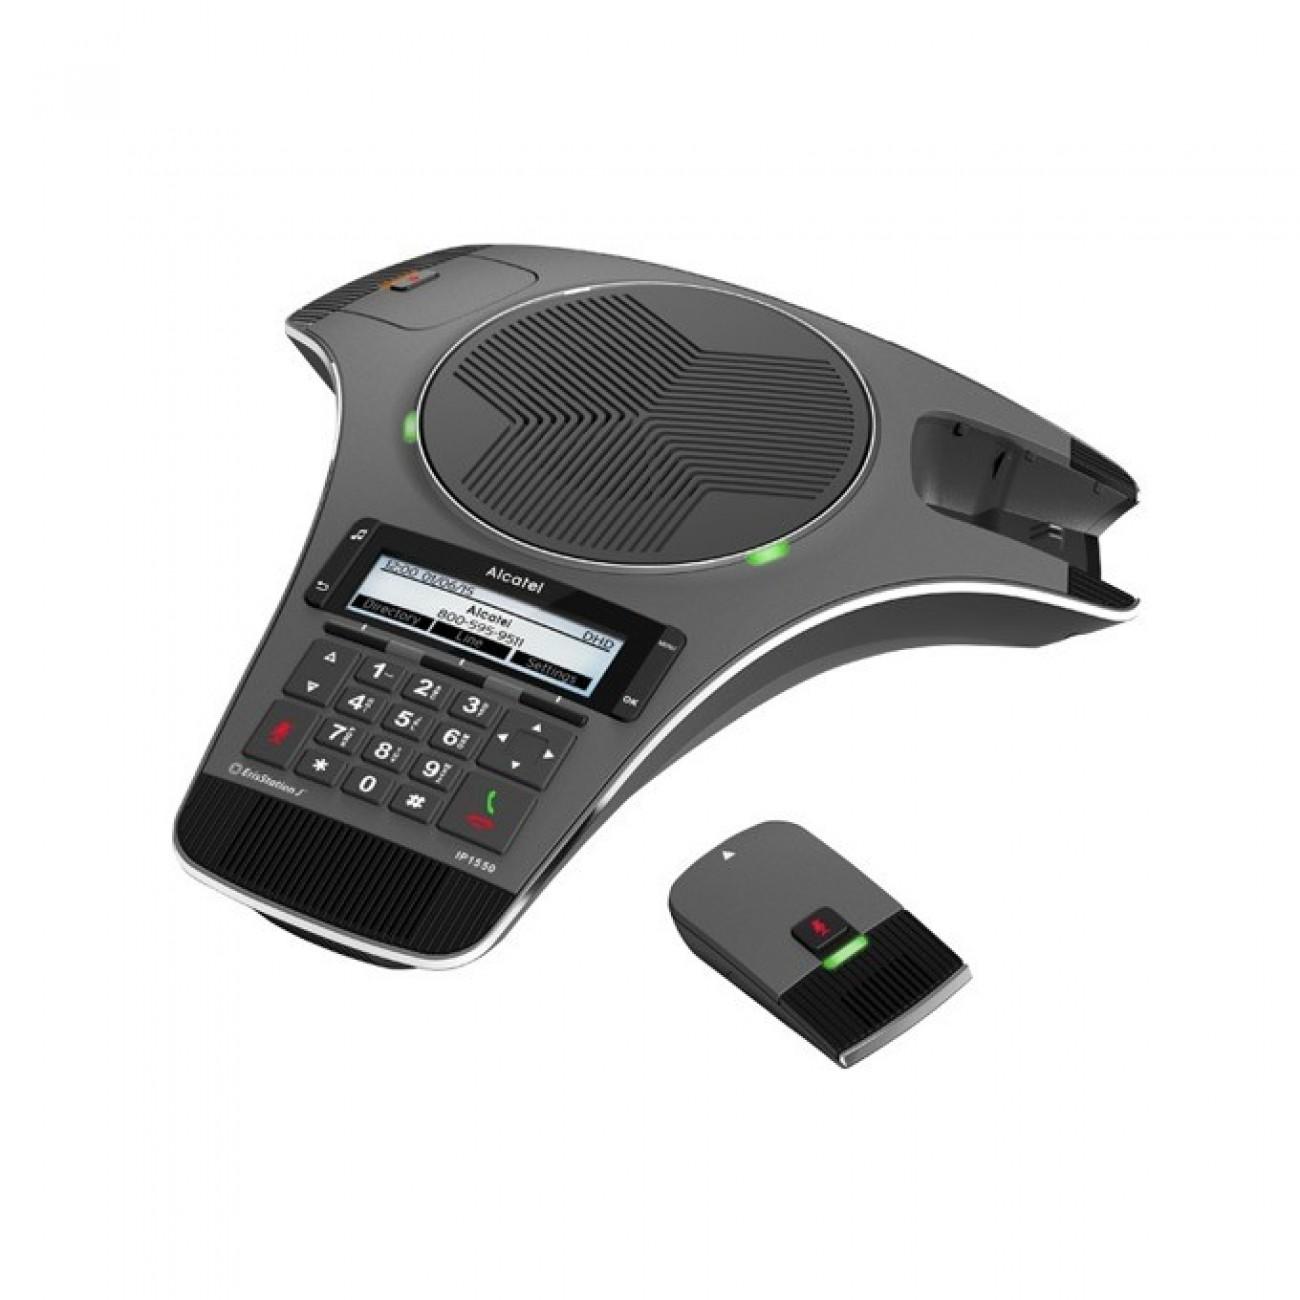 Конферентна станция Alcatel Conference IP1550, PoE, 158х57 LCD дисплей, DHCP, Bluetooth, 3x SIP акаунта, 1x 10/100 Mbps порт в Апарати за Конферентна връзка / Skype -  | Alleop